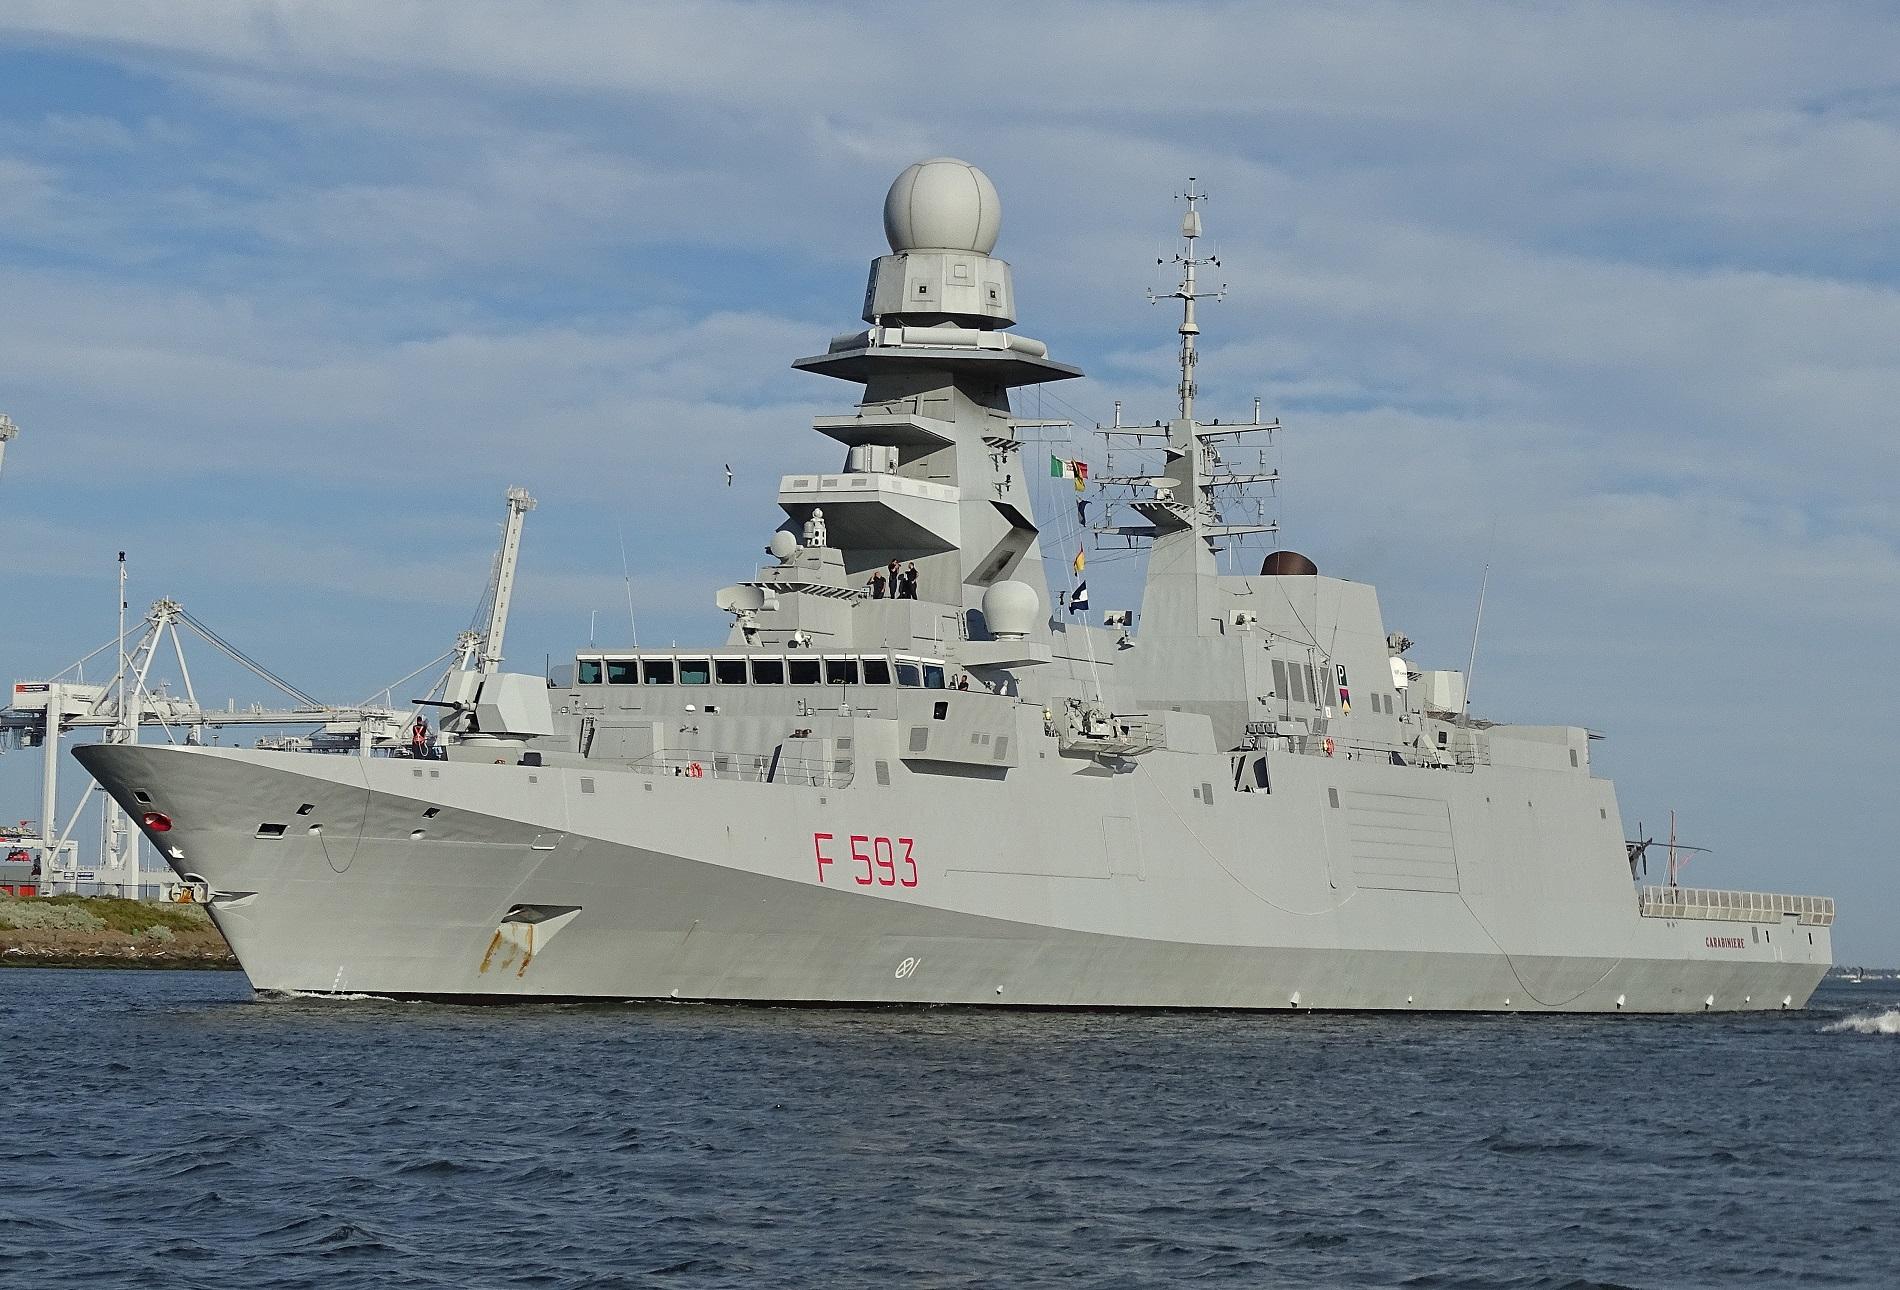 Italian Navy - Marine Italienne - Page 5 2619472